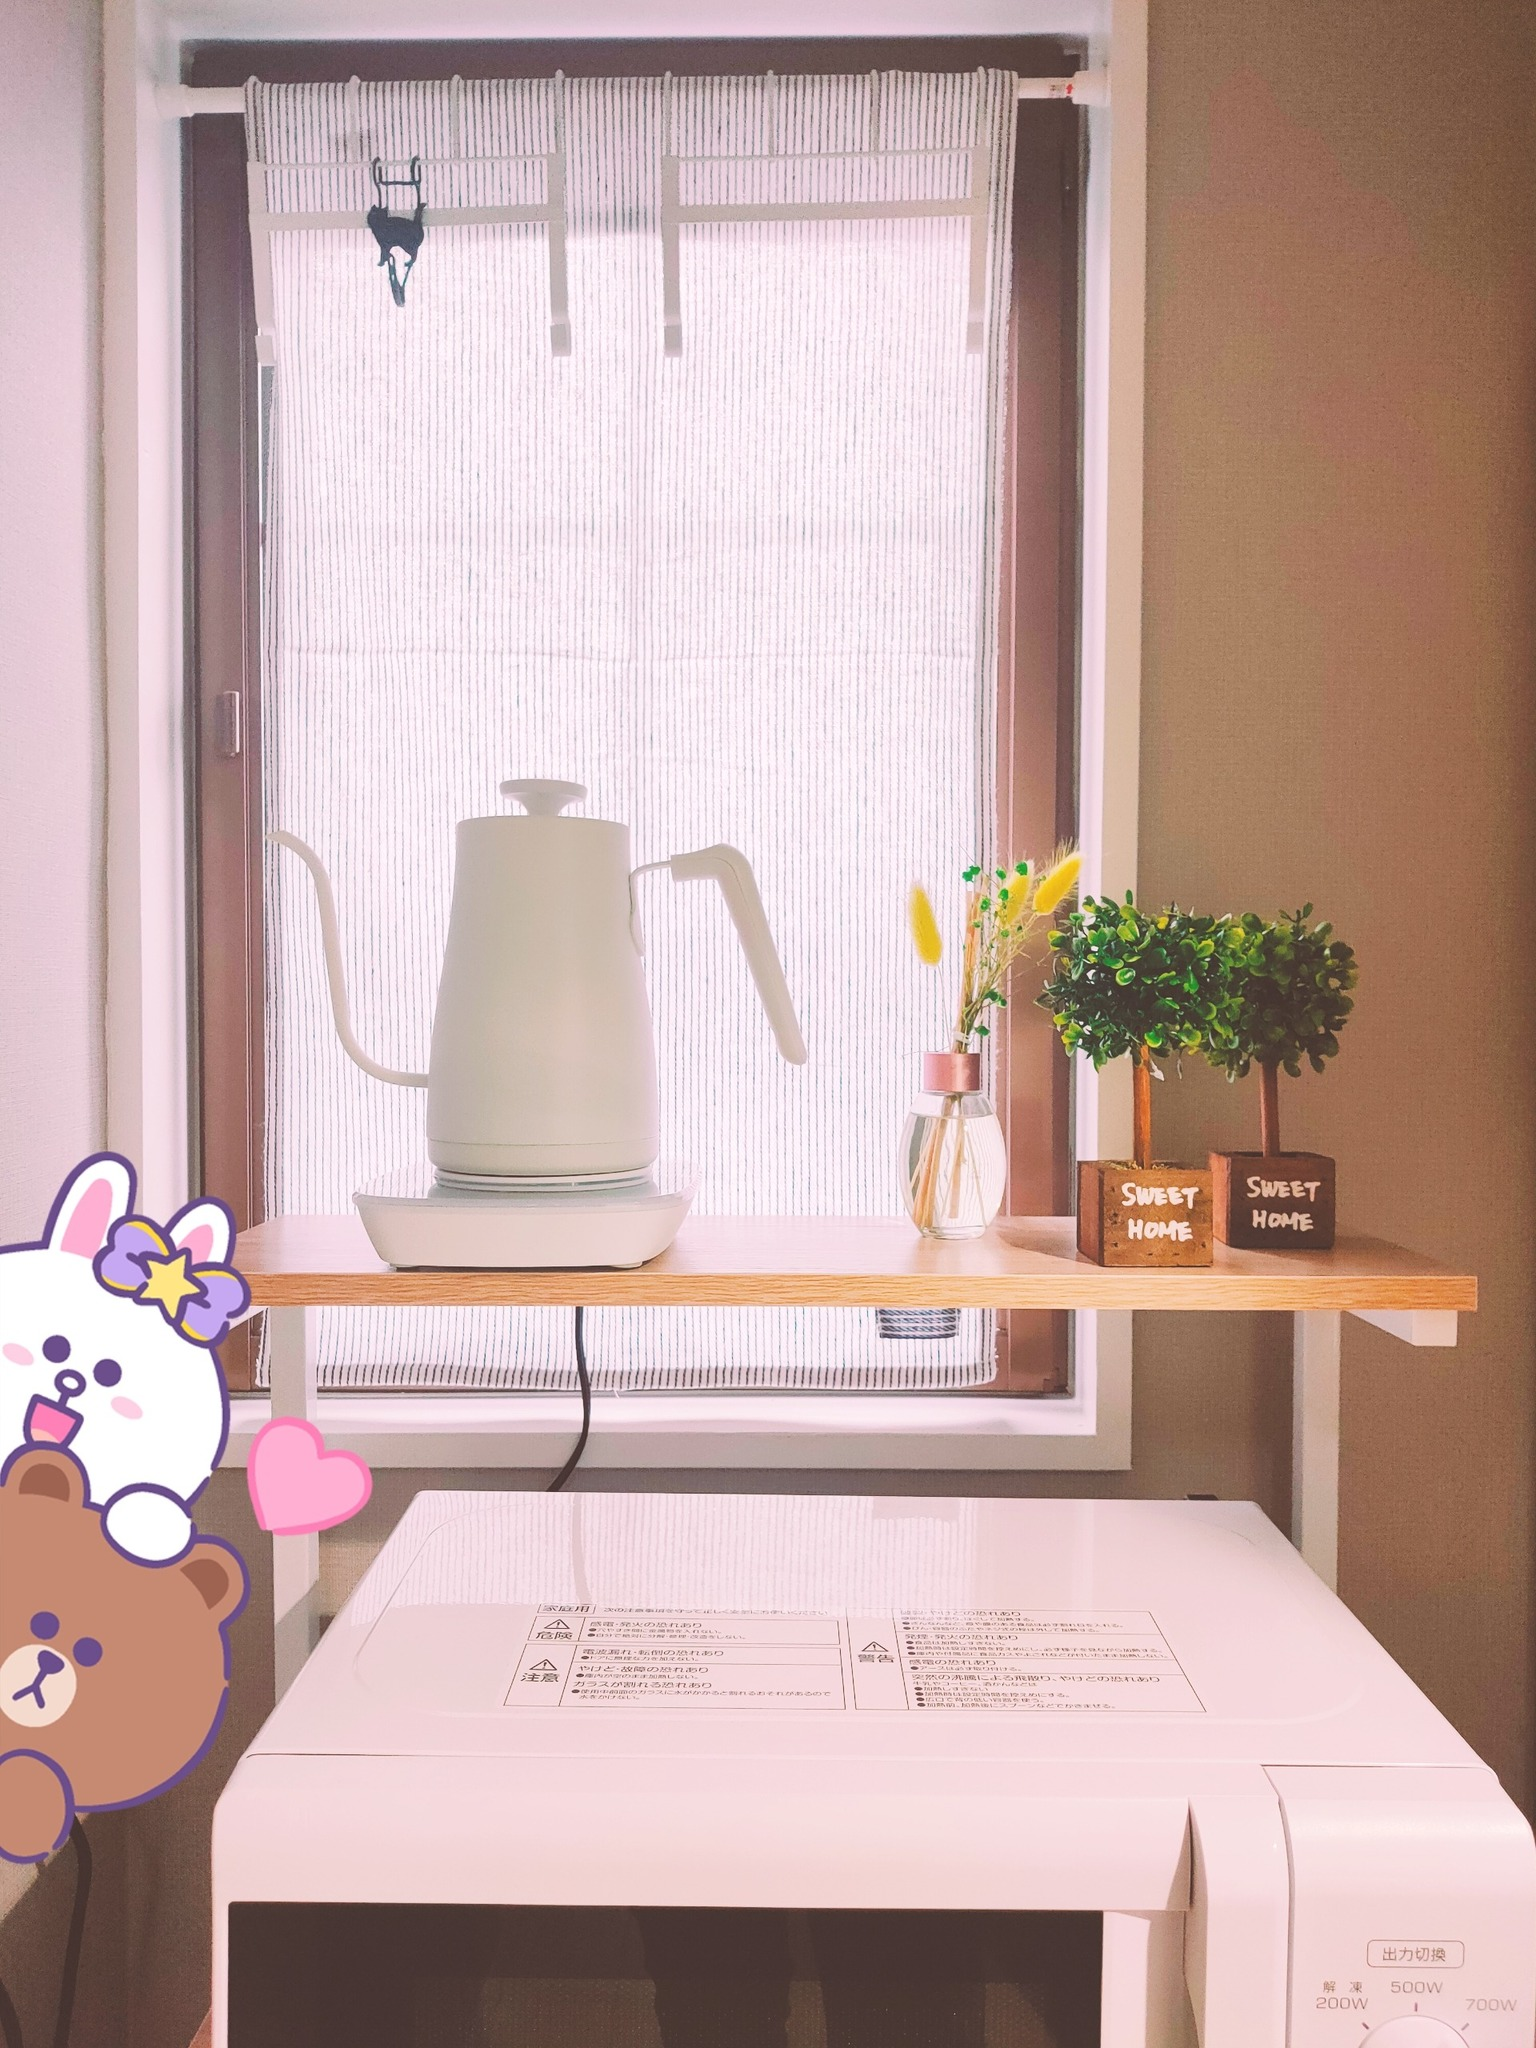 与野本町駅前★MEME Inn/民泊【Vacation STAY提供】 image